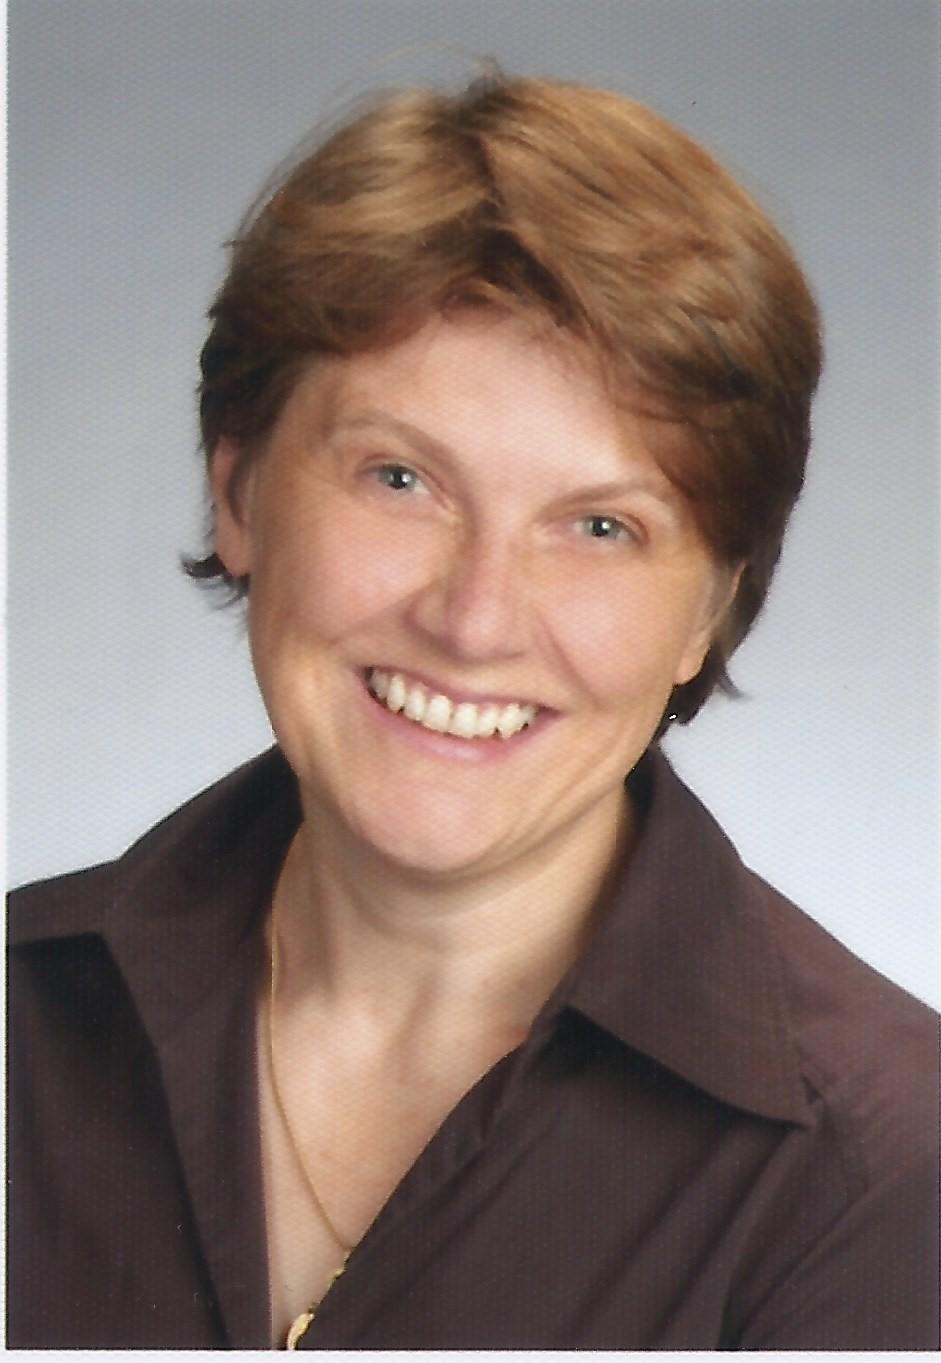 Manuela Köln